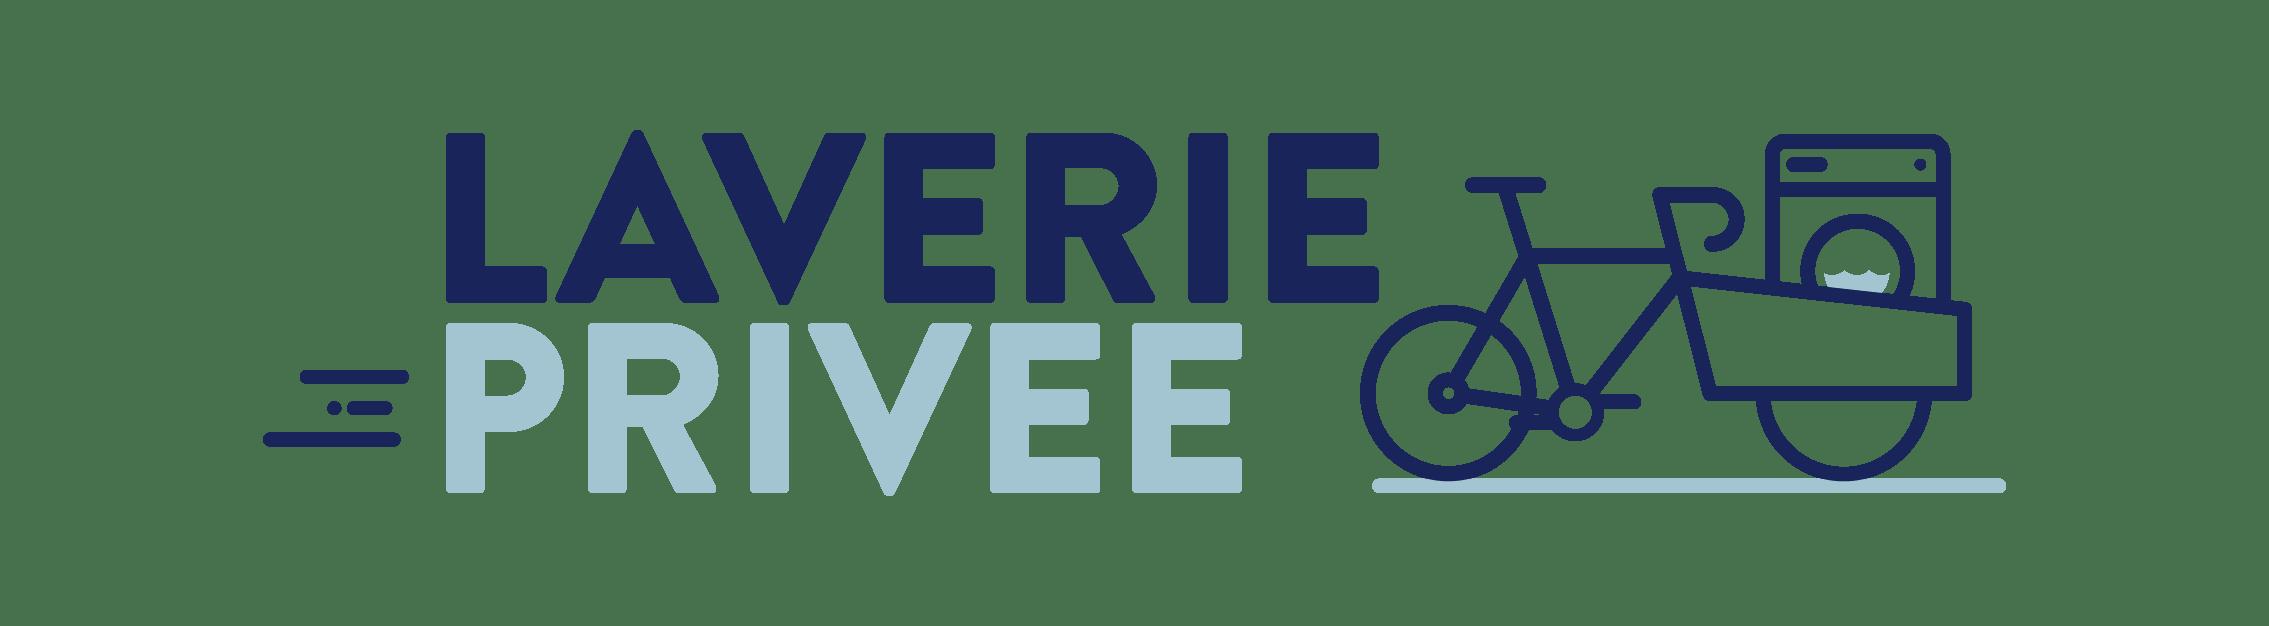 laverieprivee.com